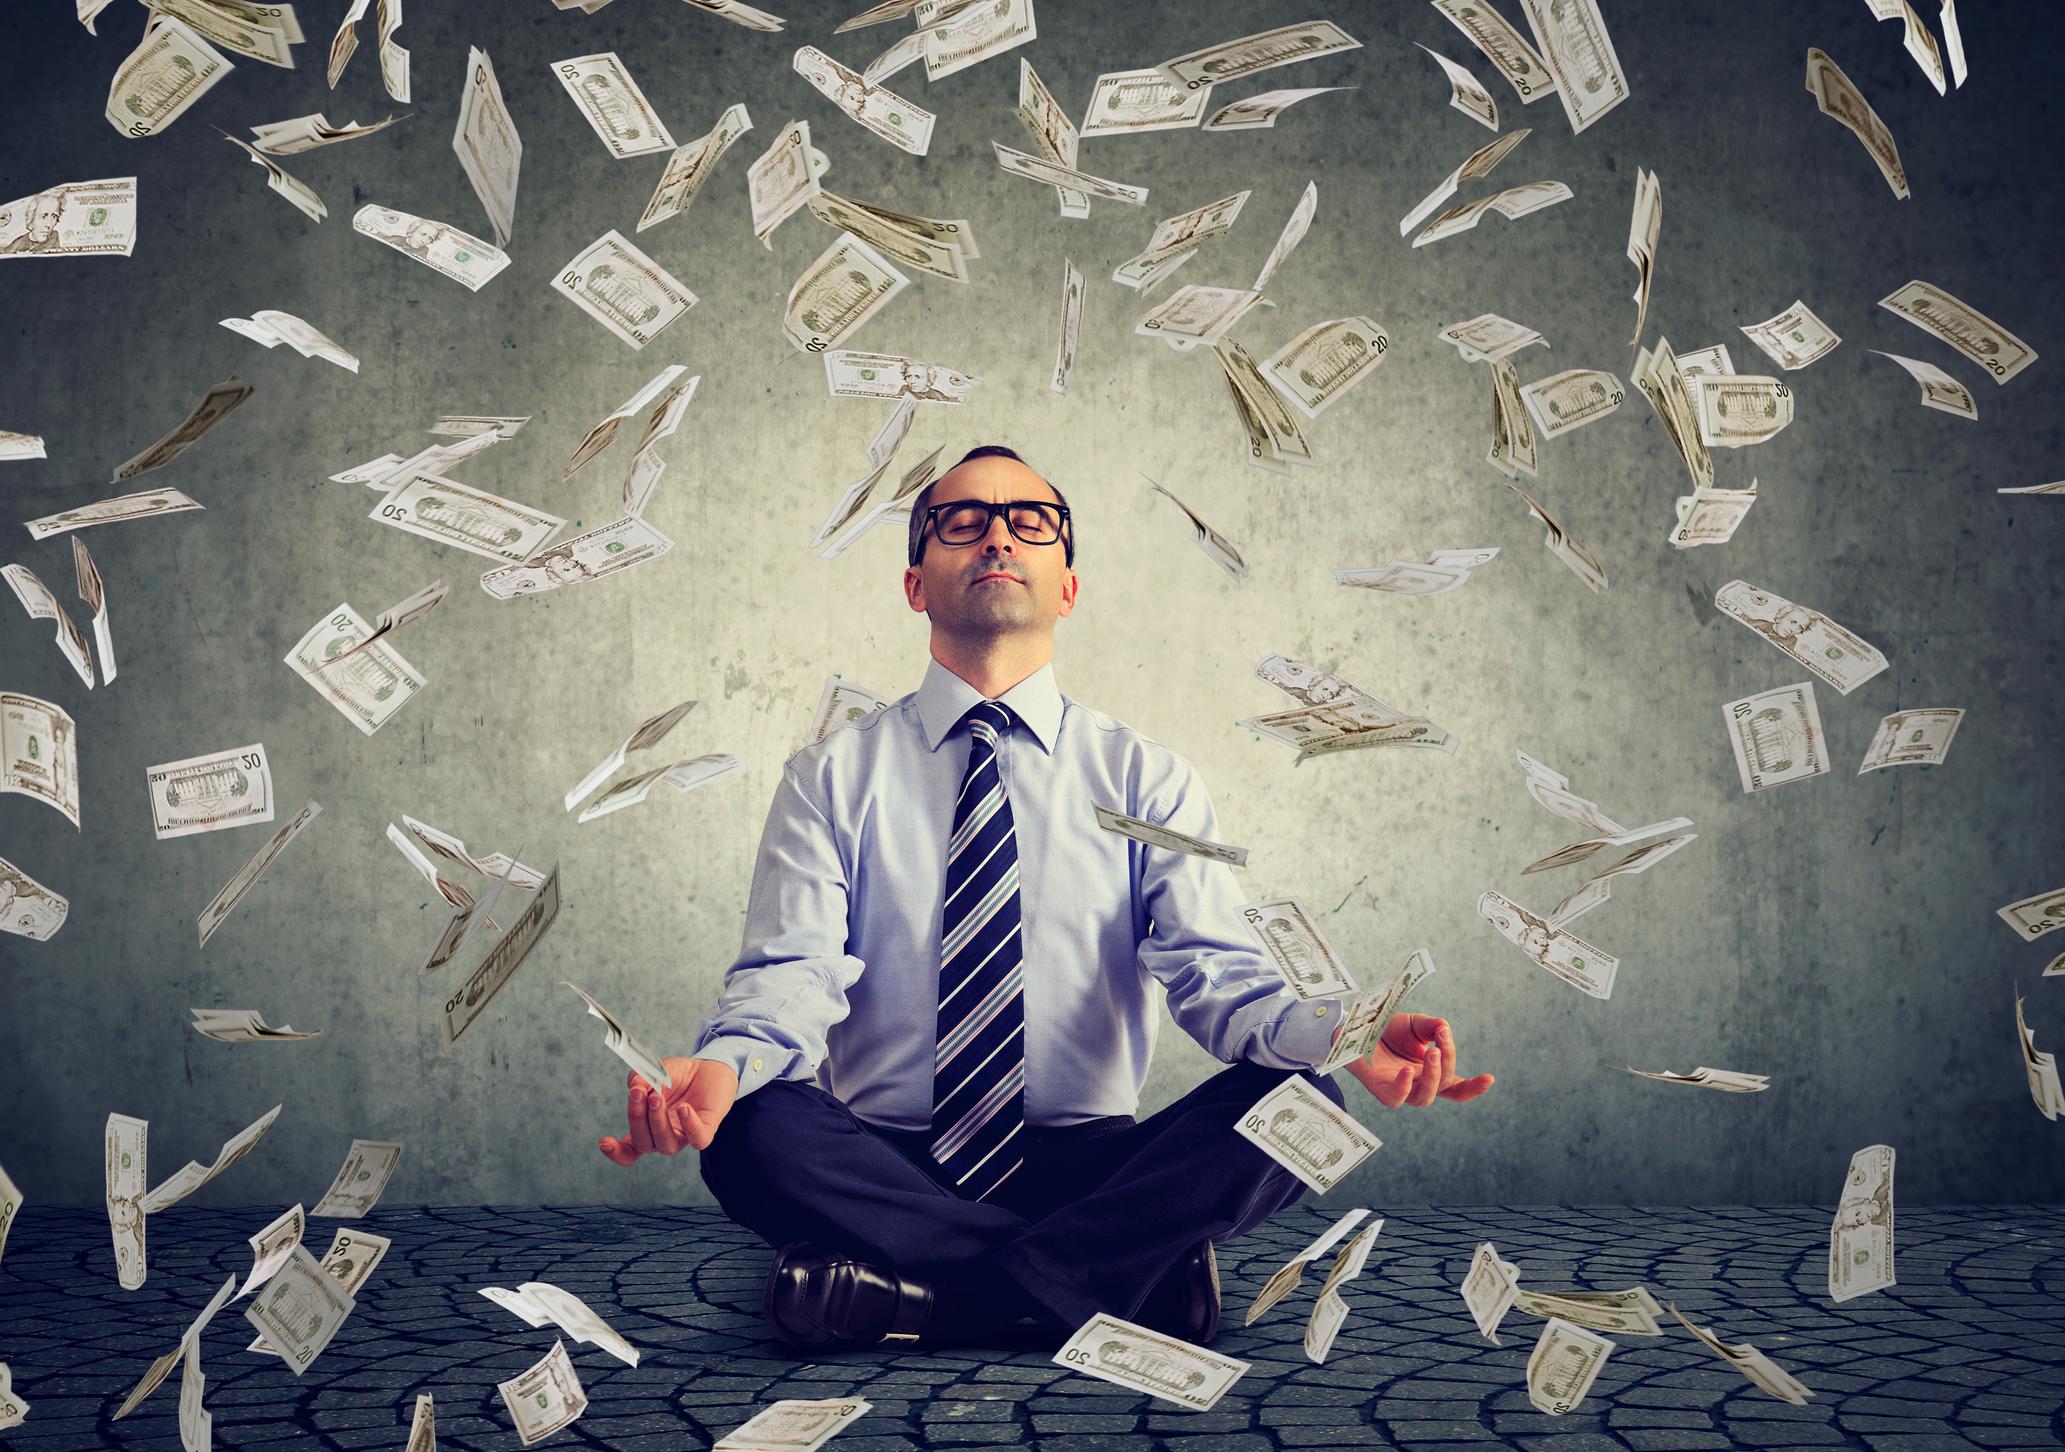 man yoga pose money falling GettyImages-842014930